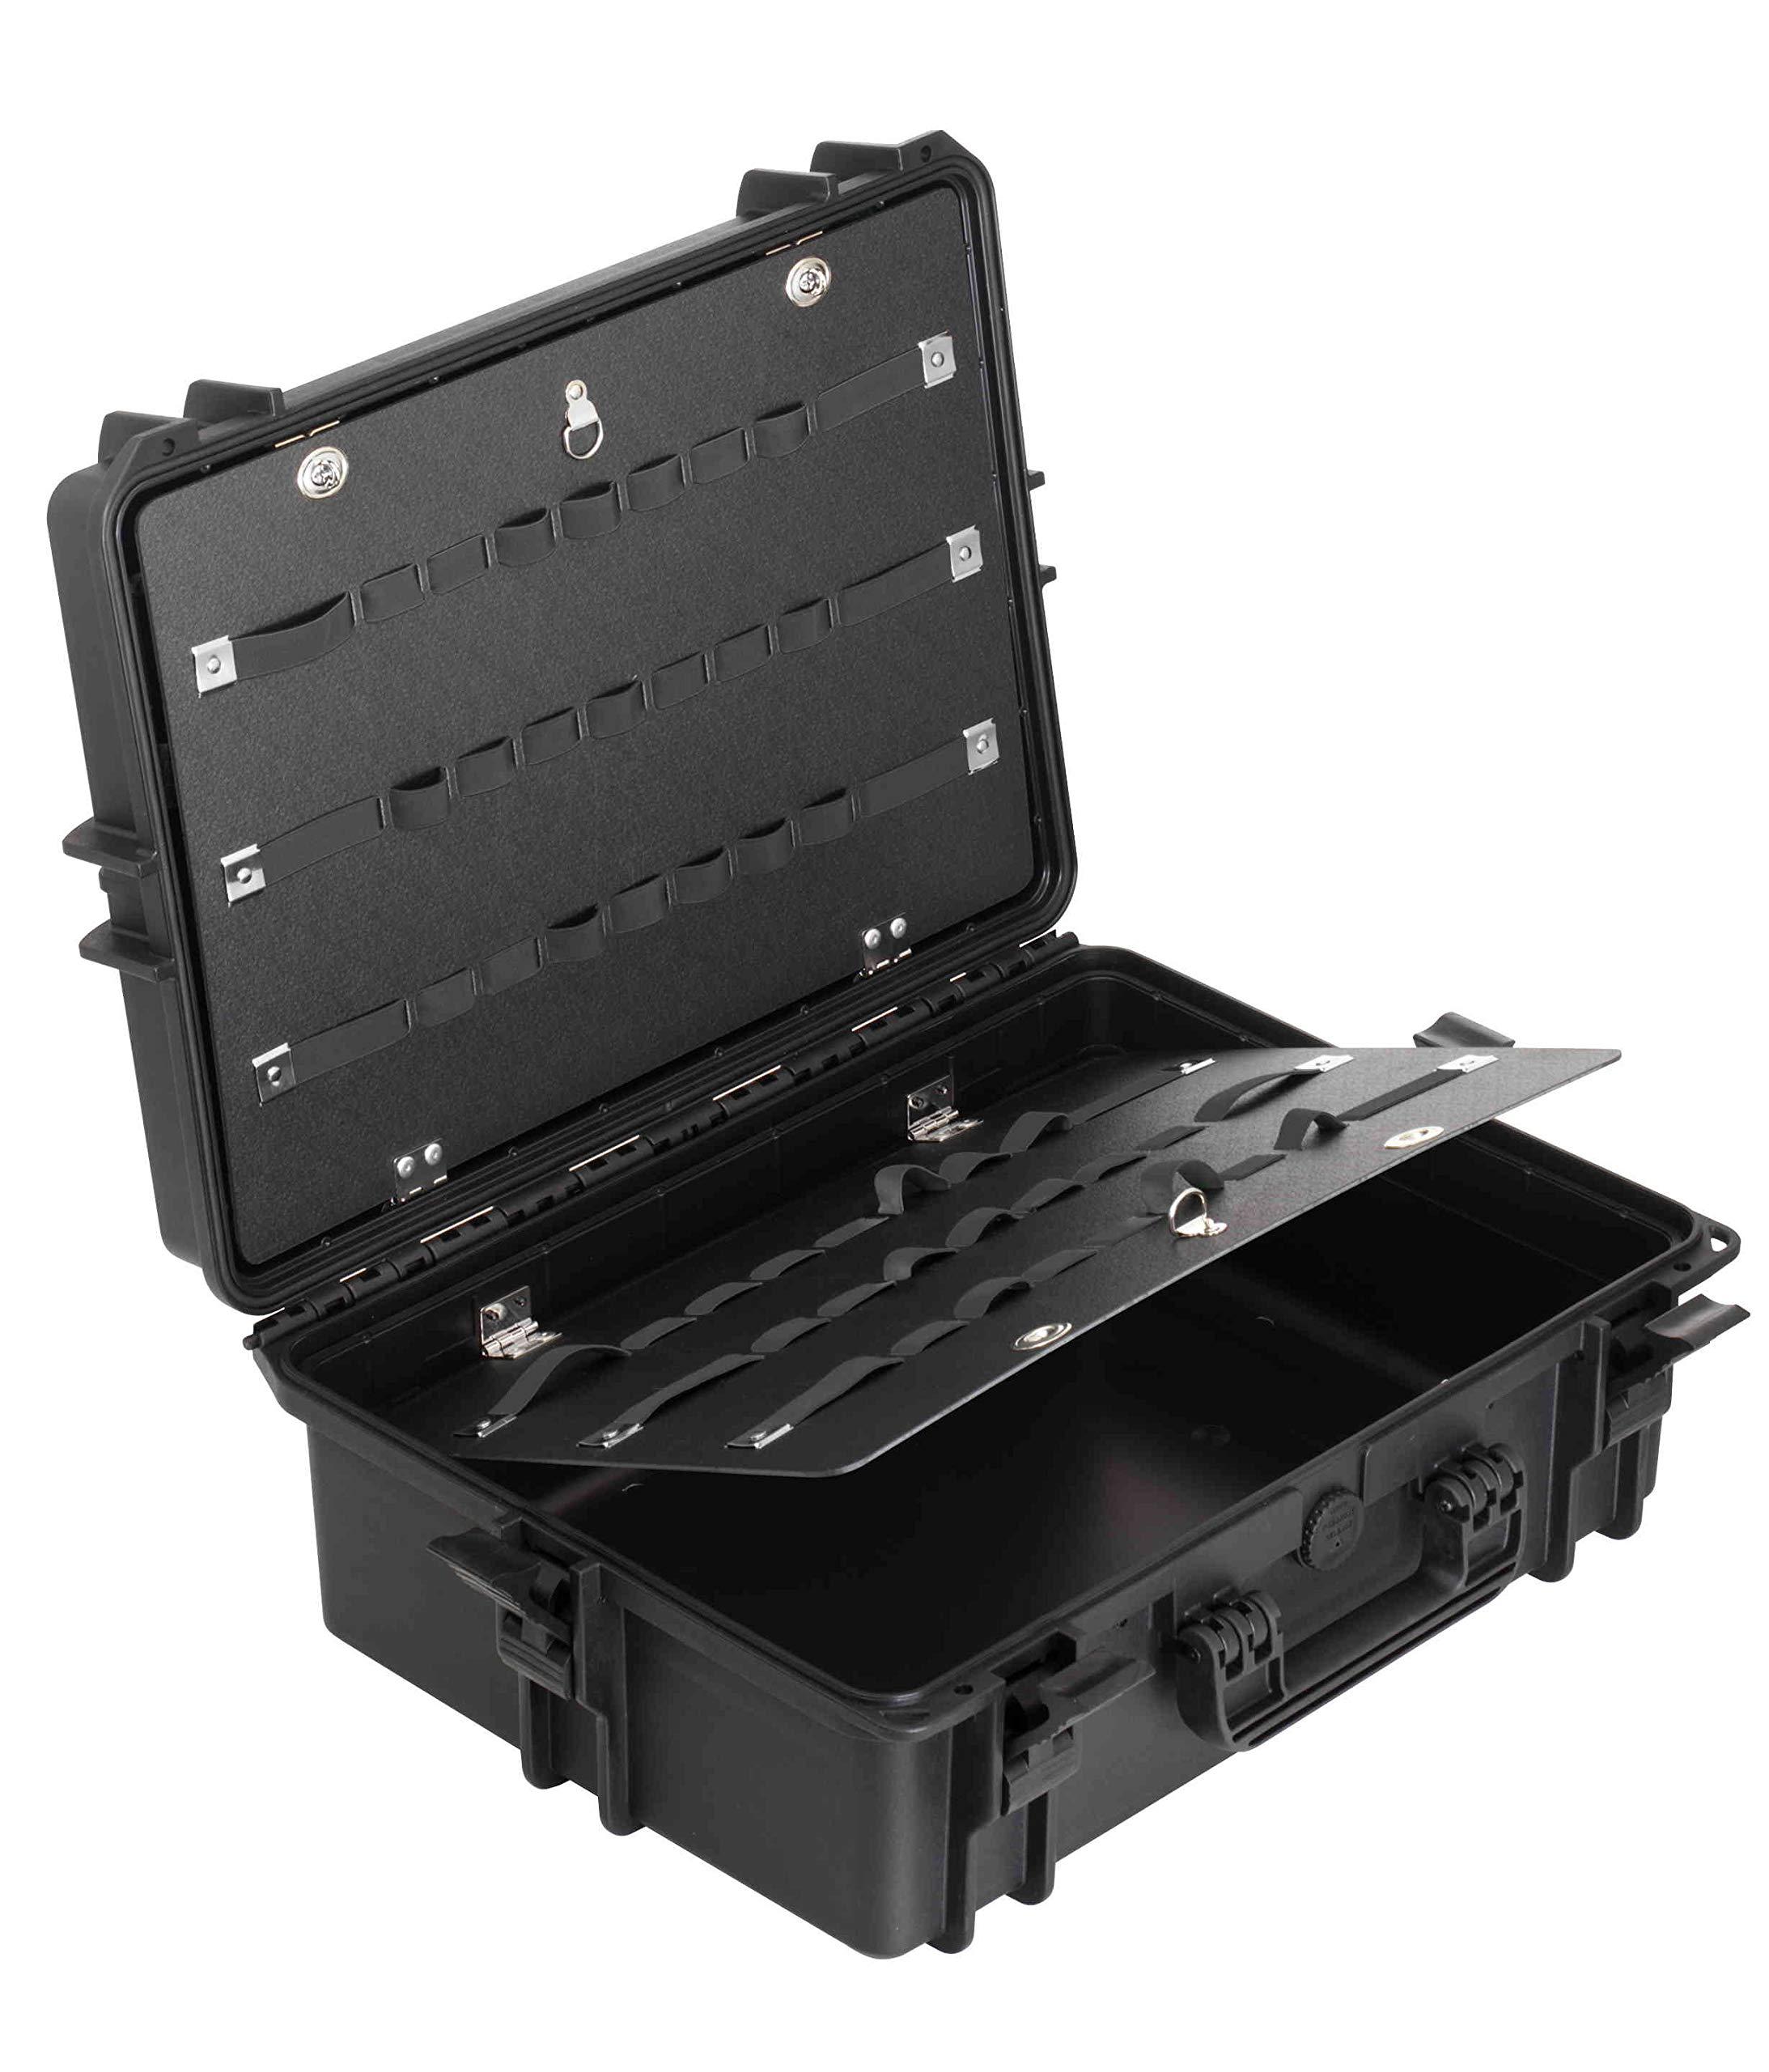 TAF-CASE-Outdoor-Koffer-wasserdicht-Trolleyserie